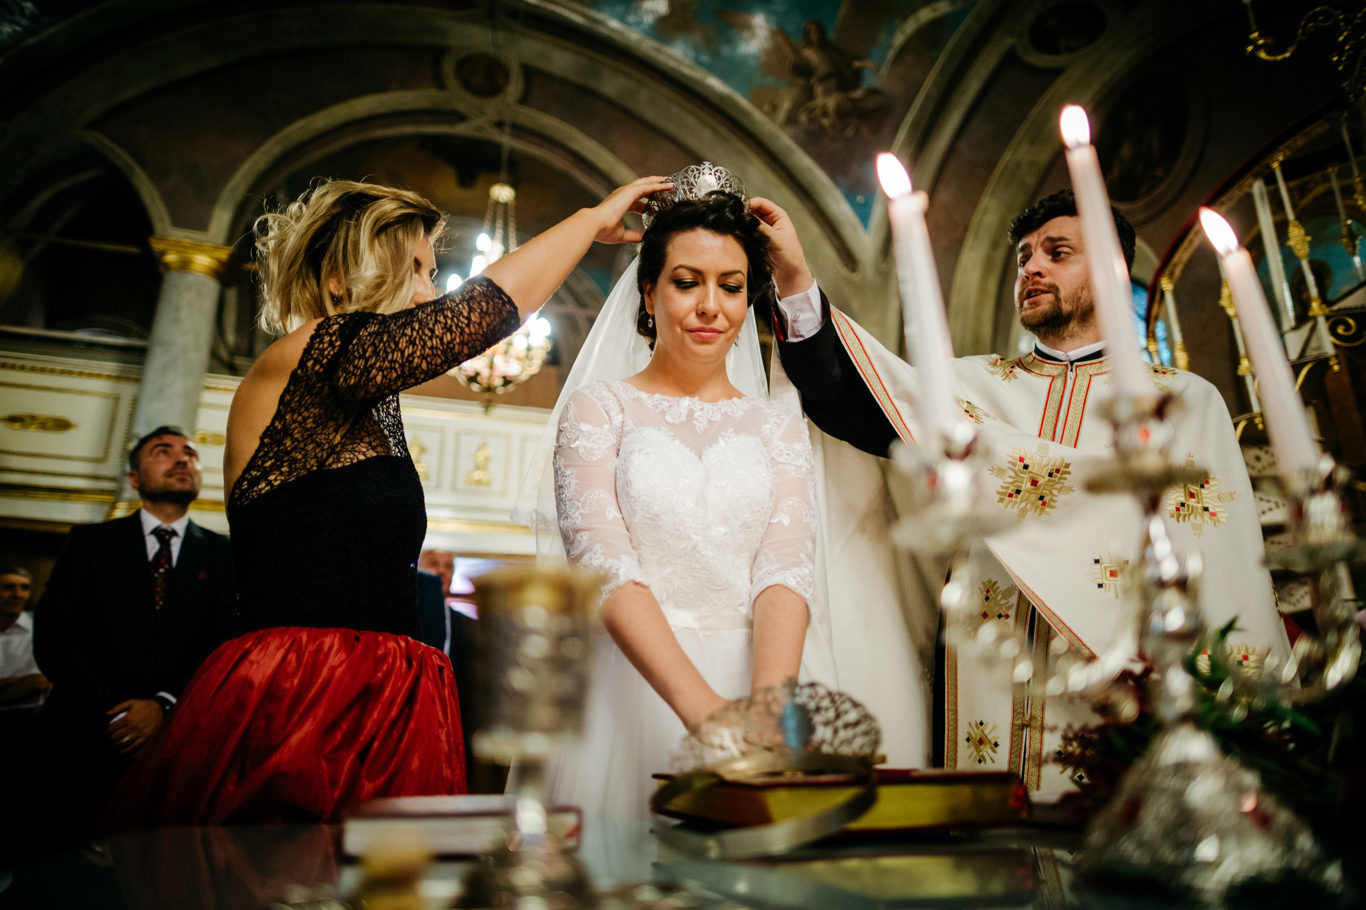 0425-fotografie-nunta-bucuresti-anca-george-fotograf-ciprian-dumitrescu-cdf_0190-3